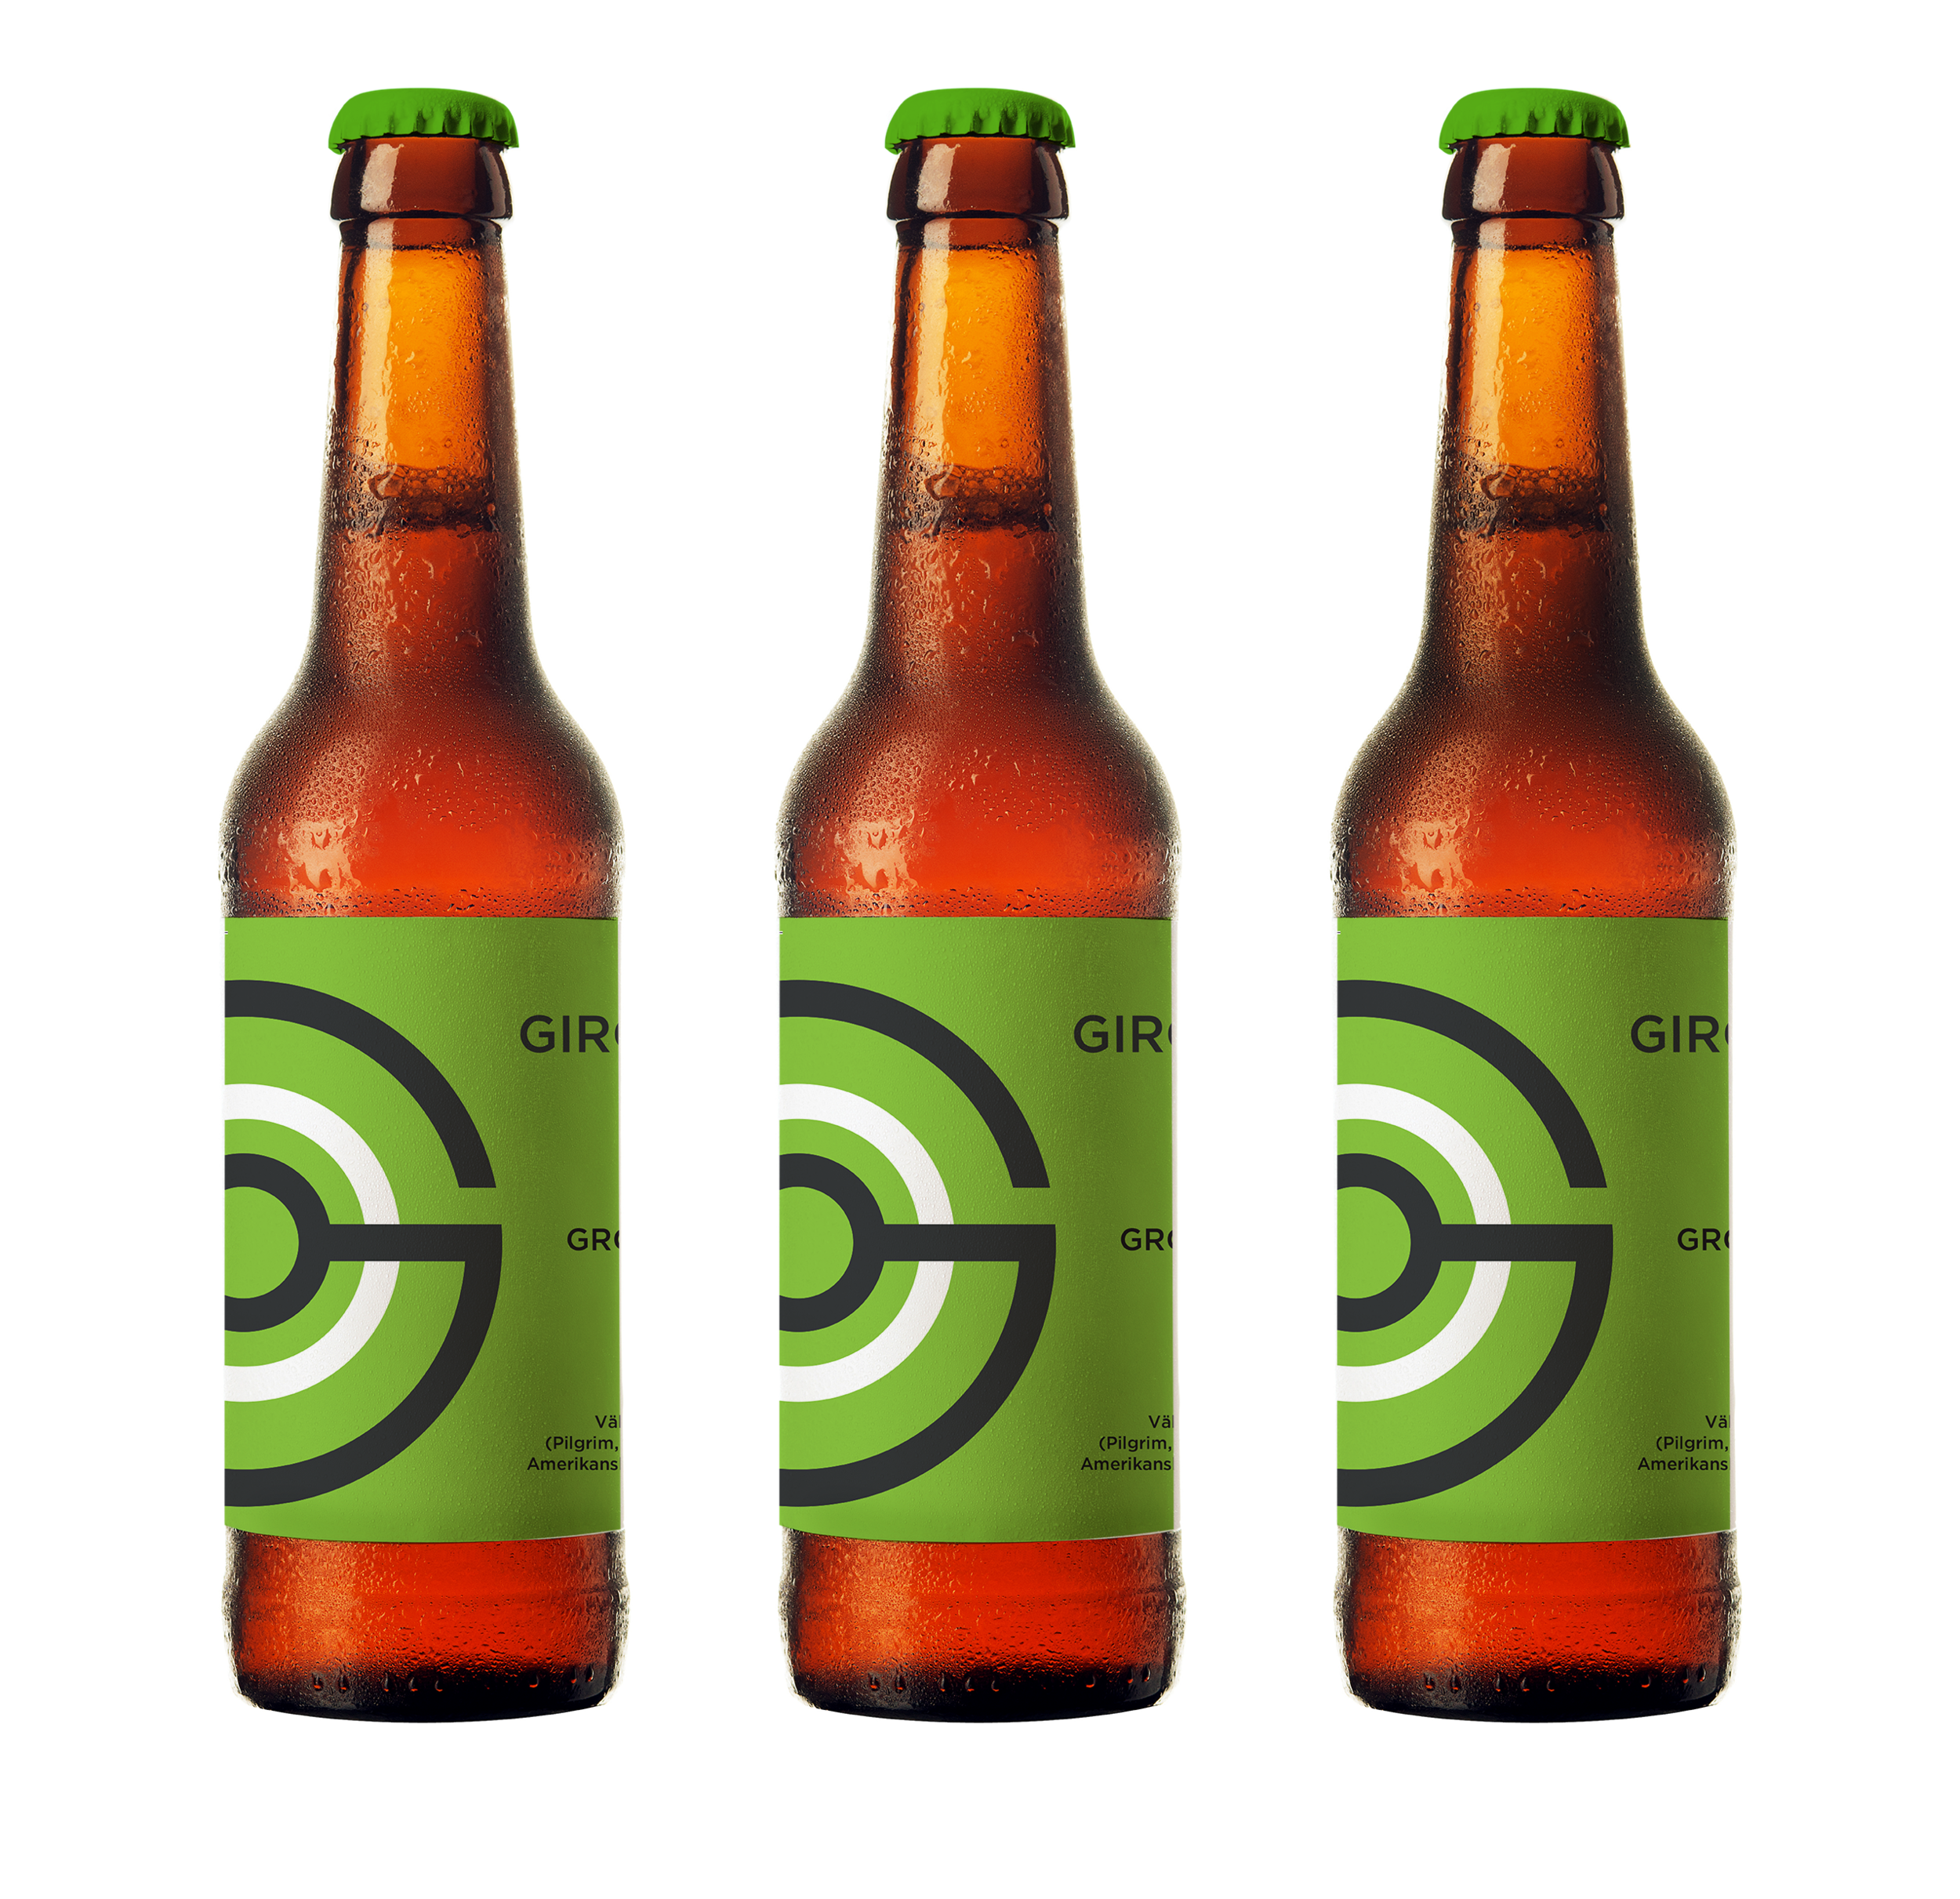 GIROT Gröna American Wheat Beer